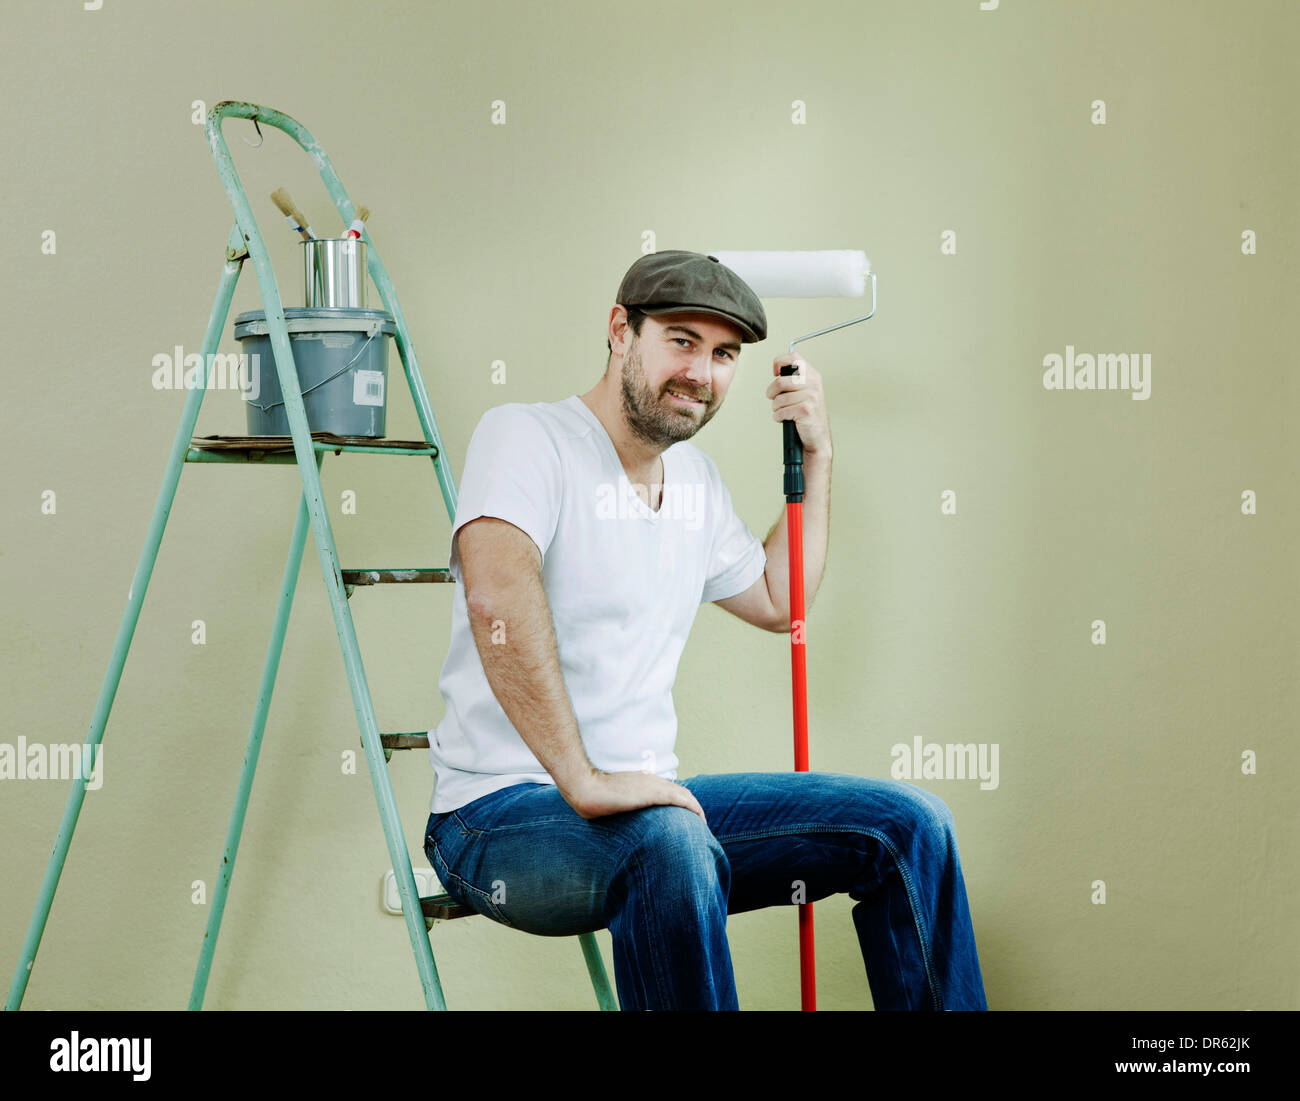 Man decorating, taking a break, Munich, Bavaria, Germany - Stock Image